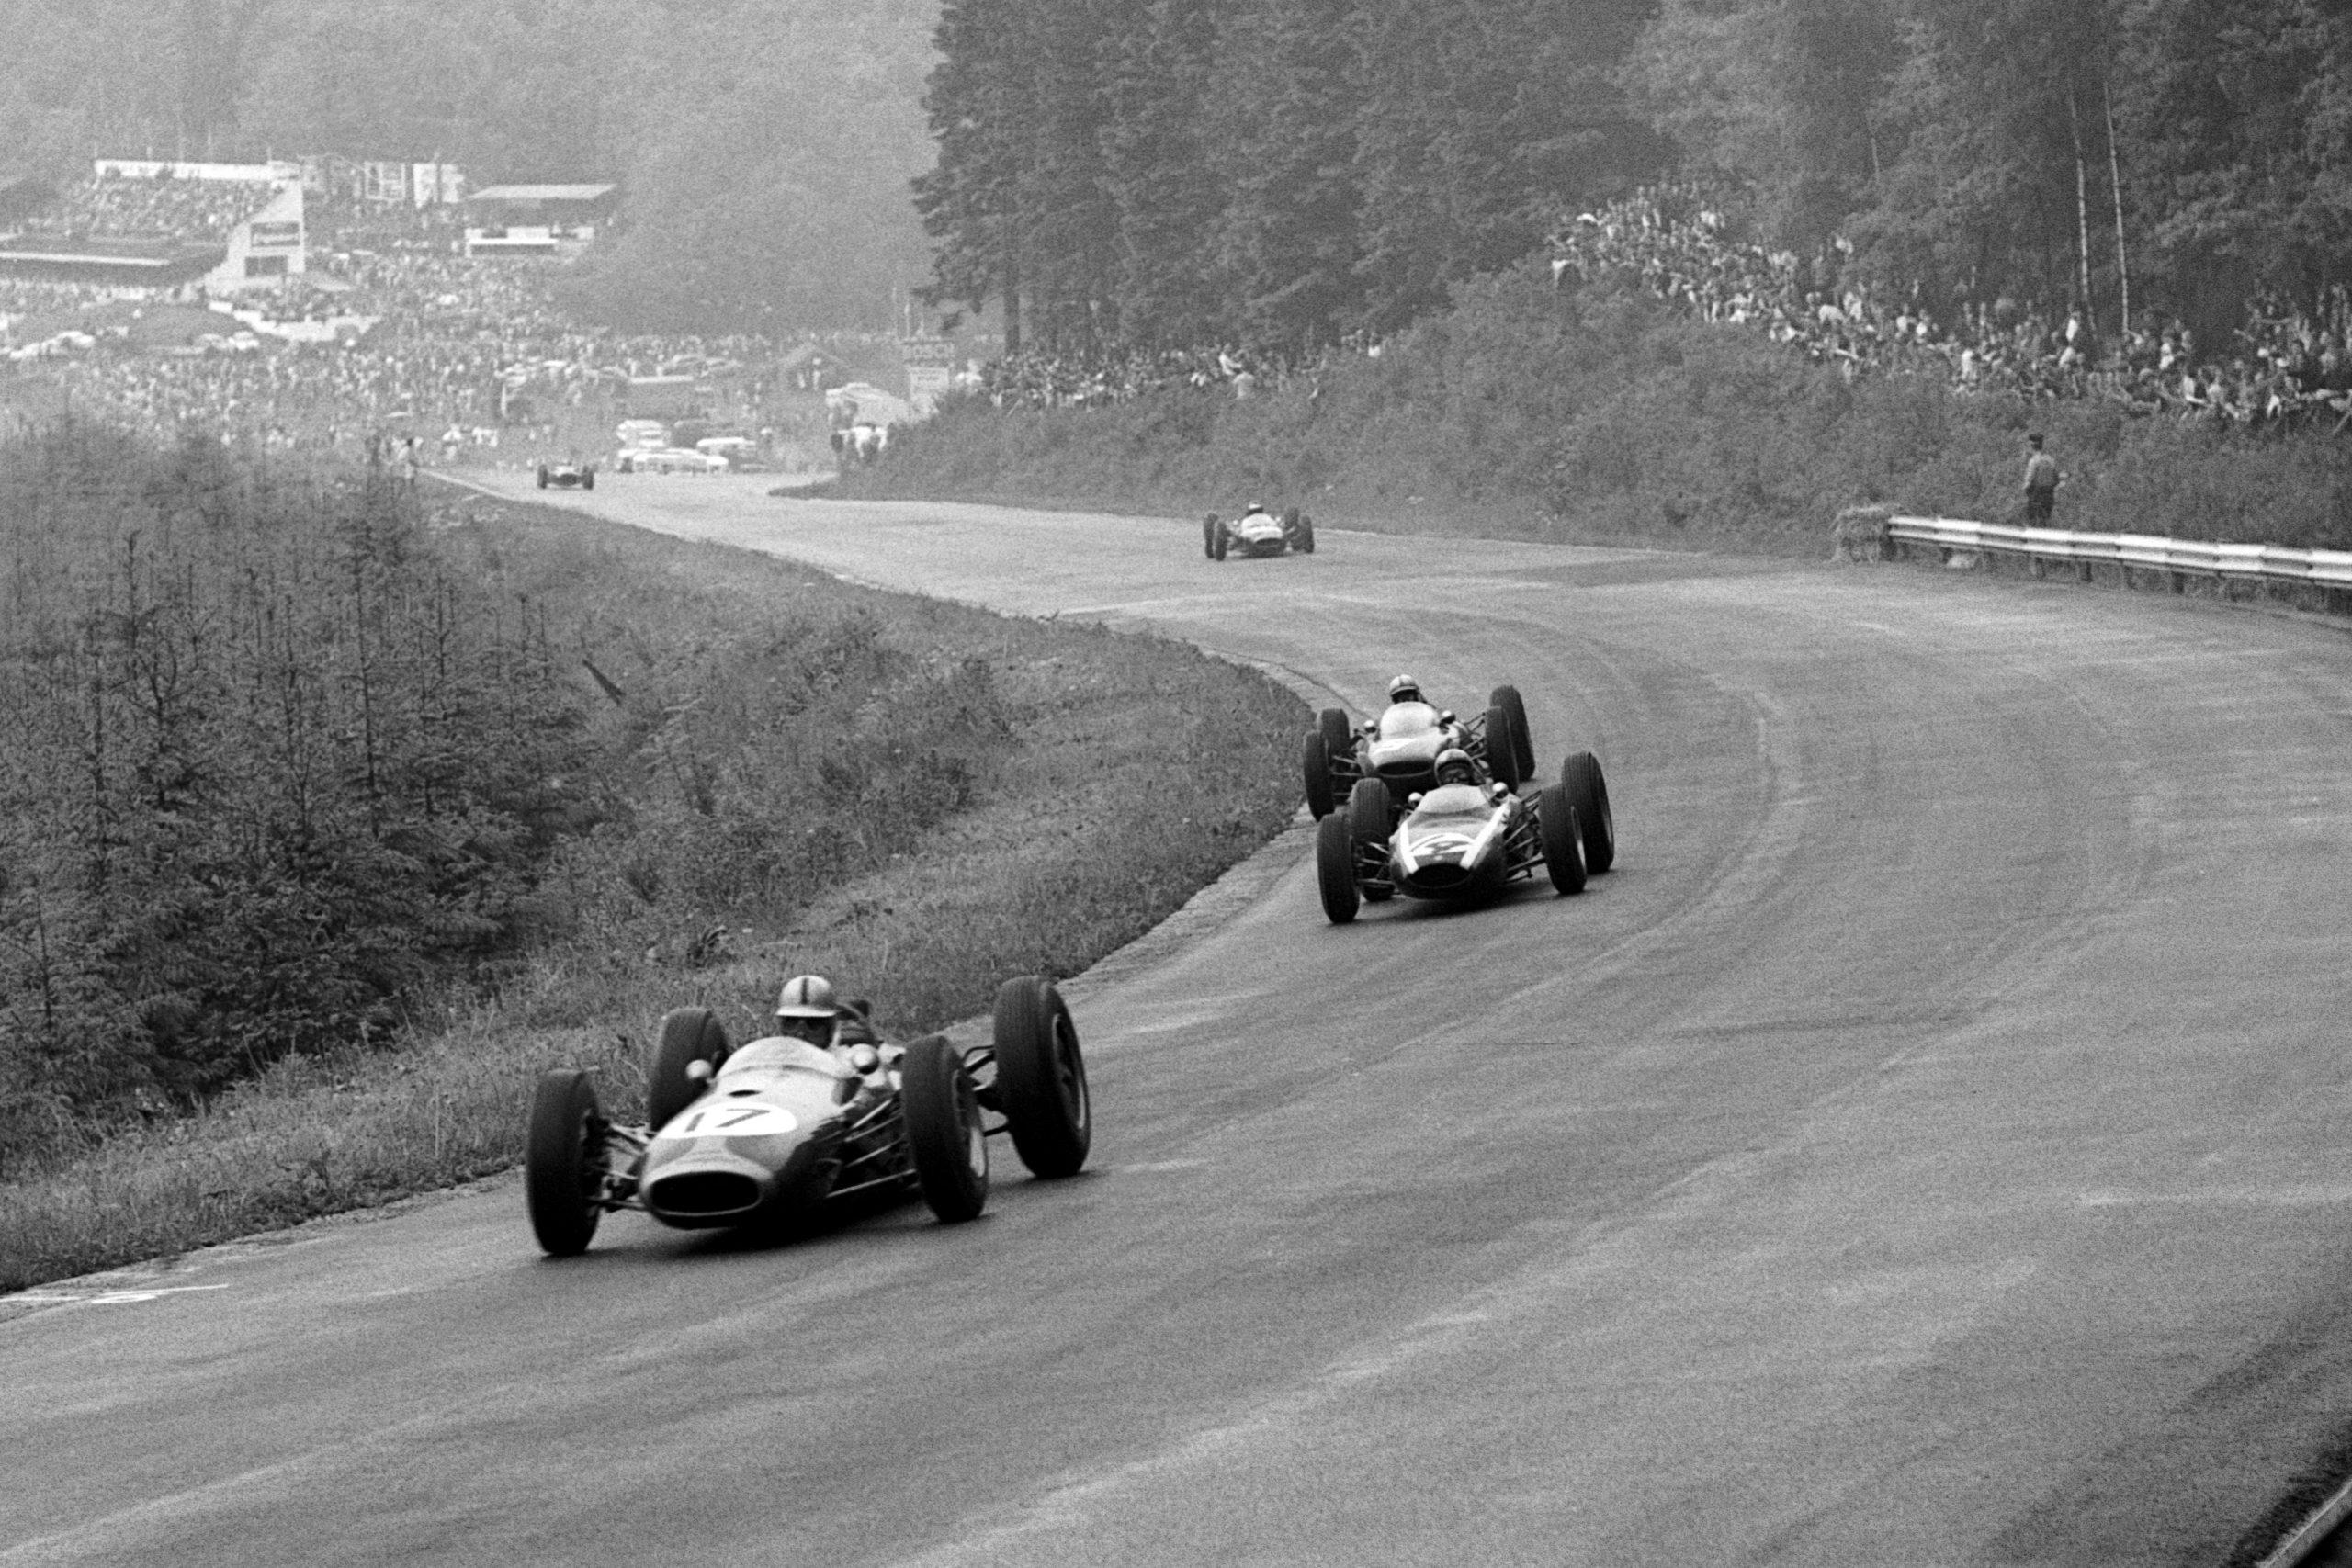 Jack Brabham in his Brabham BT3.